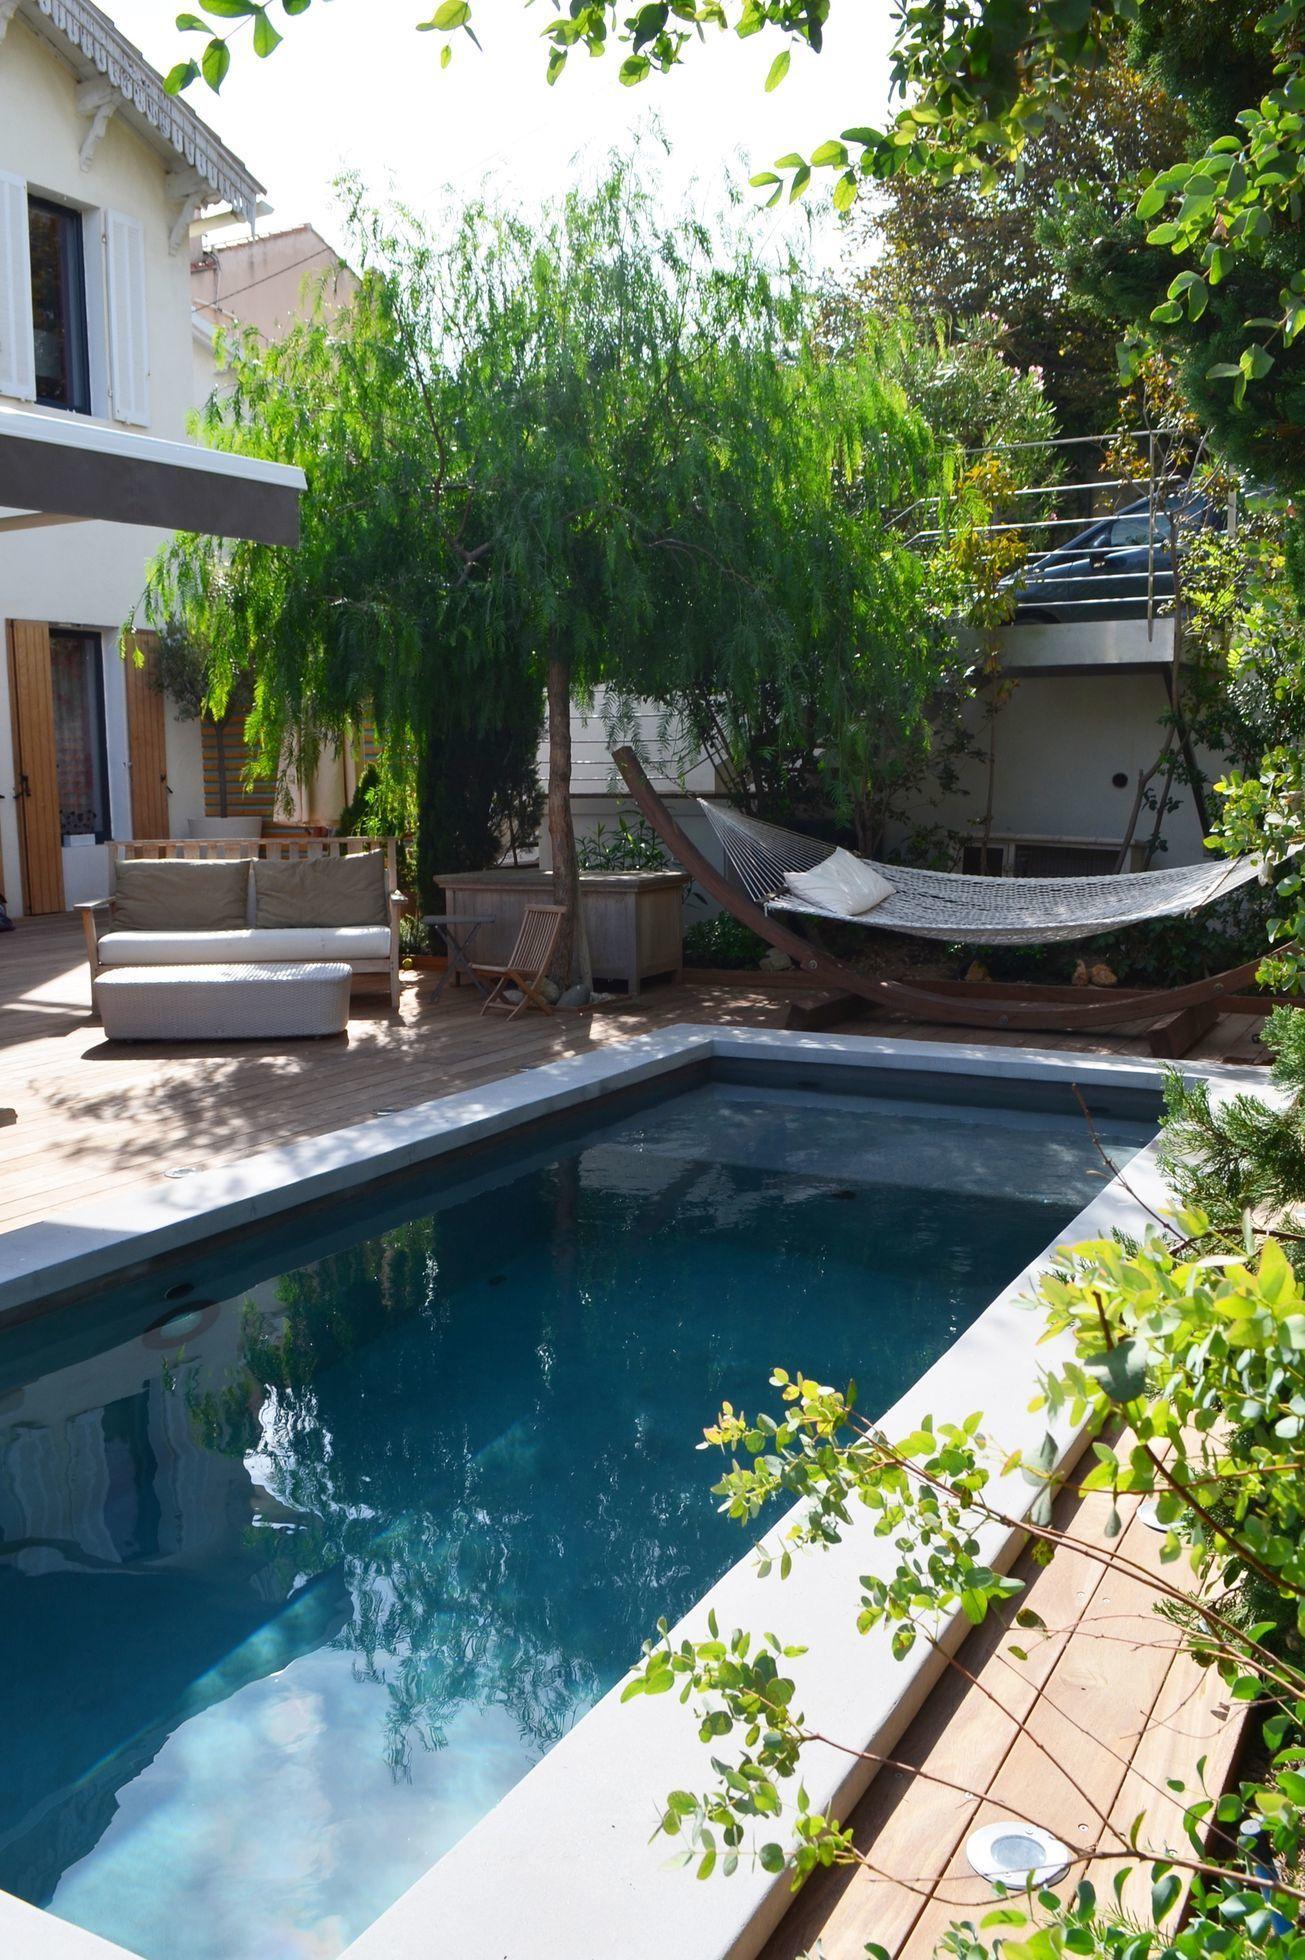 Prix Piscine Aquilus Mini Water piscine : créer un coin piscine agréable   petite piscine